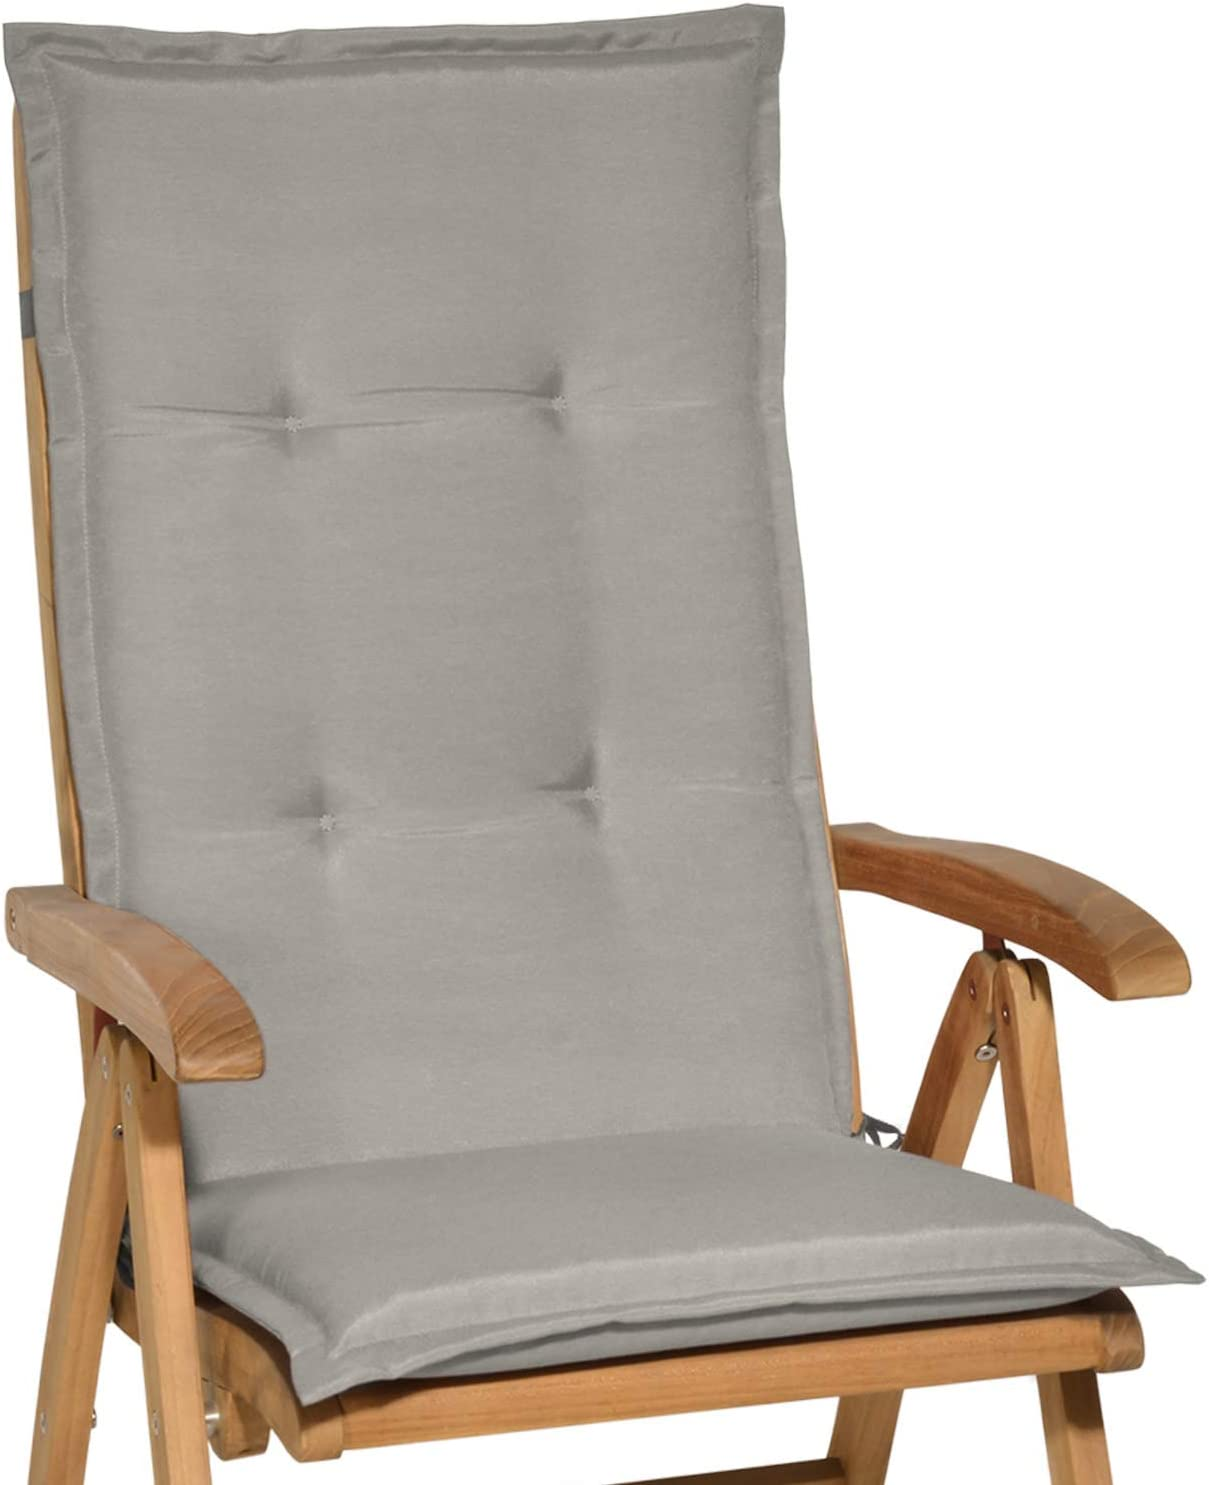 Beautissu Loft HL - Cojín para sillas de balcón o Asiento Exterior con Respaldo Alto - 120x50x6 cm - Placas compactas de gomaespuma - Gris Claro